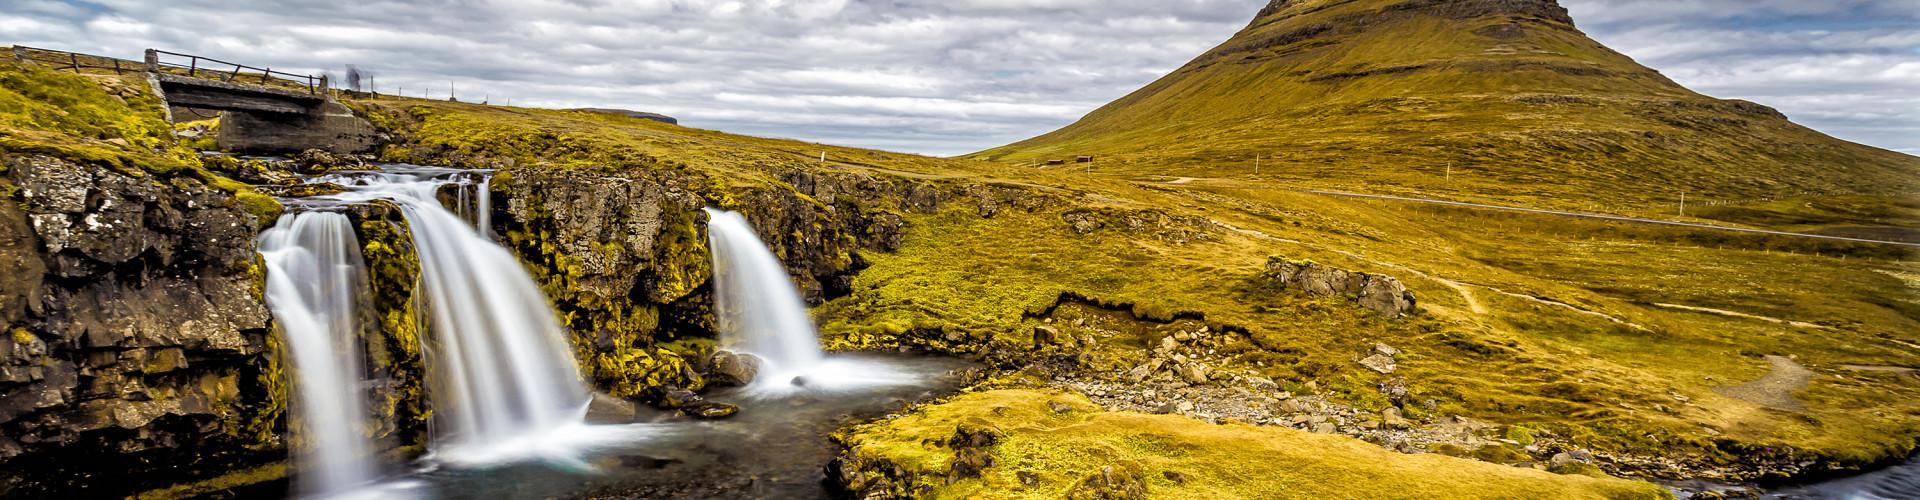 Wasserfall © Mario Dirks_Q7A1775-